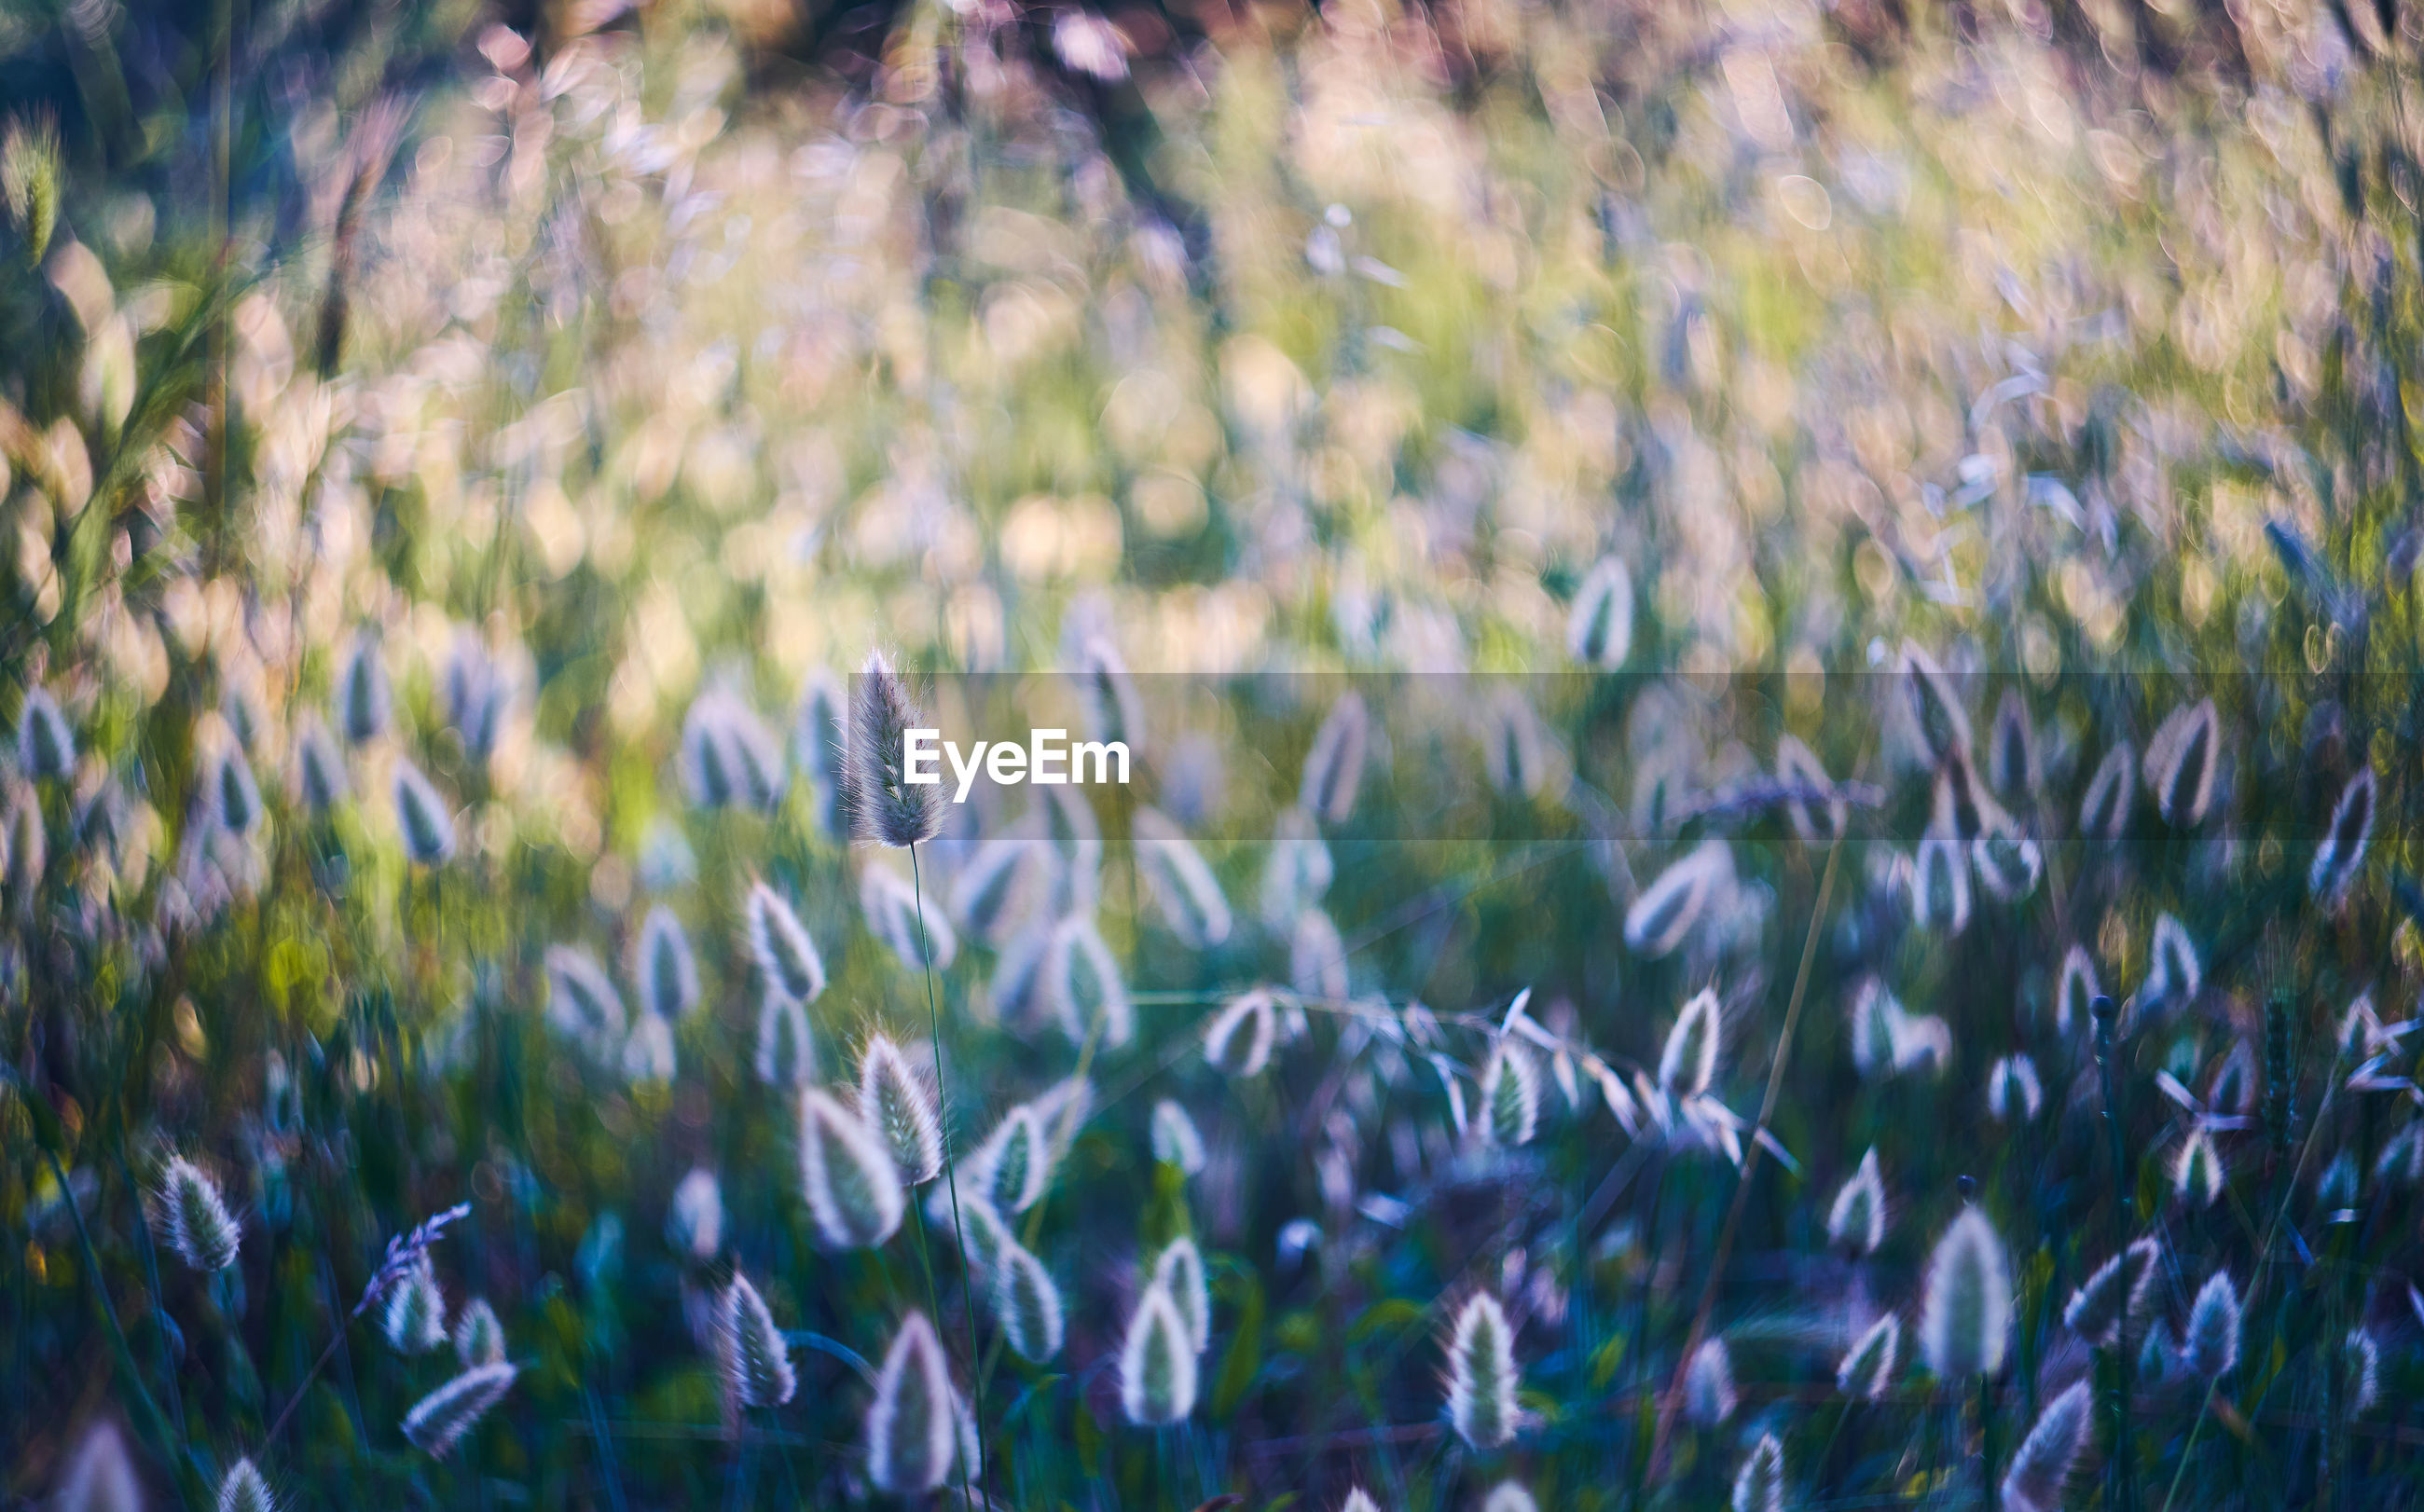 Close-up of fresh purple flowers on field